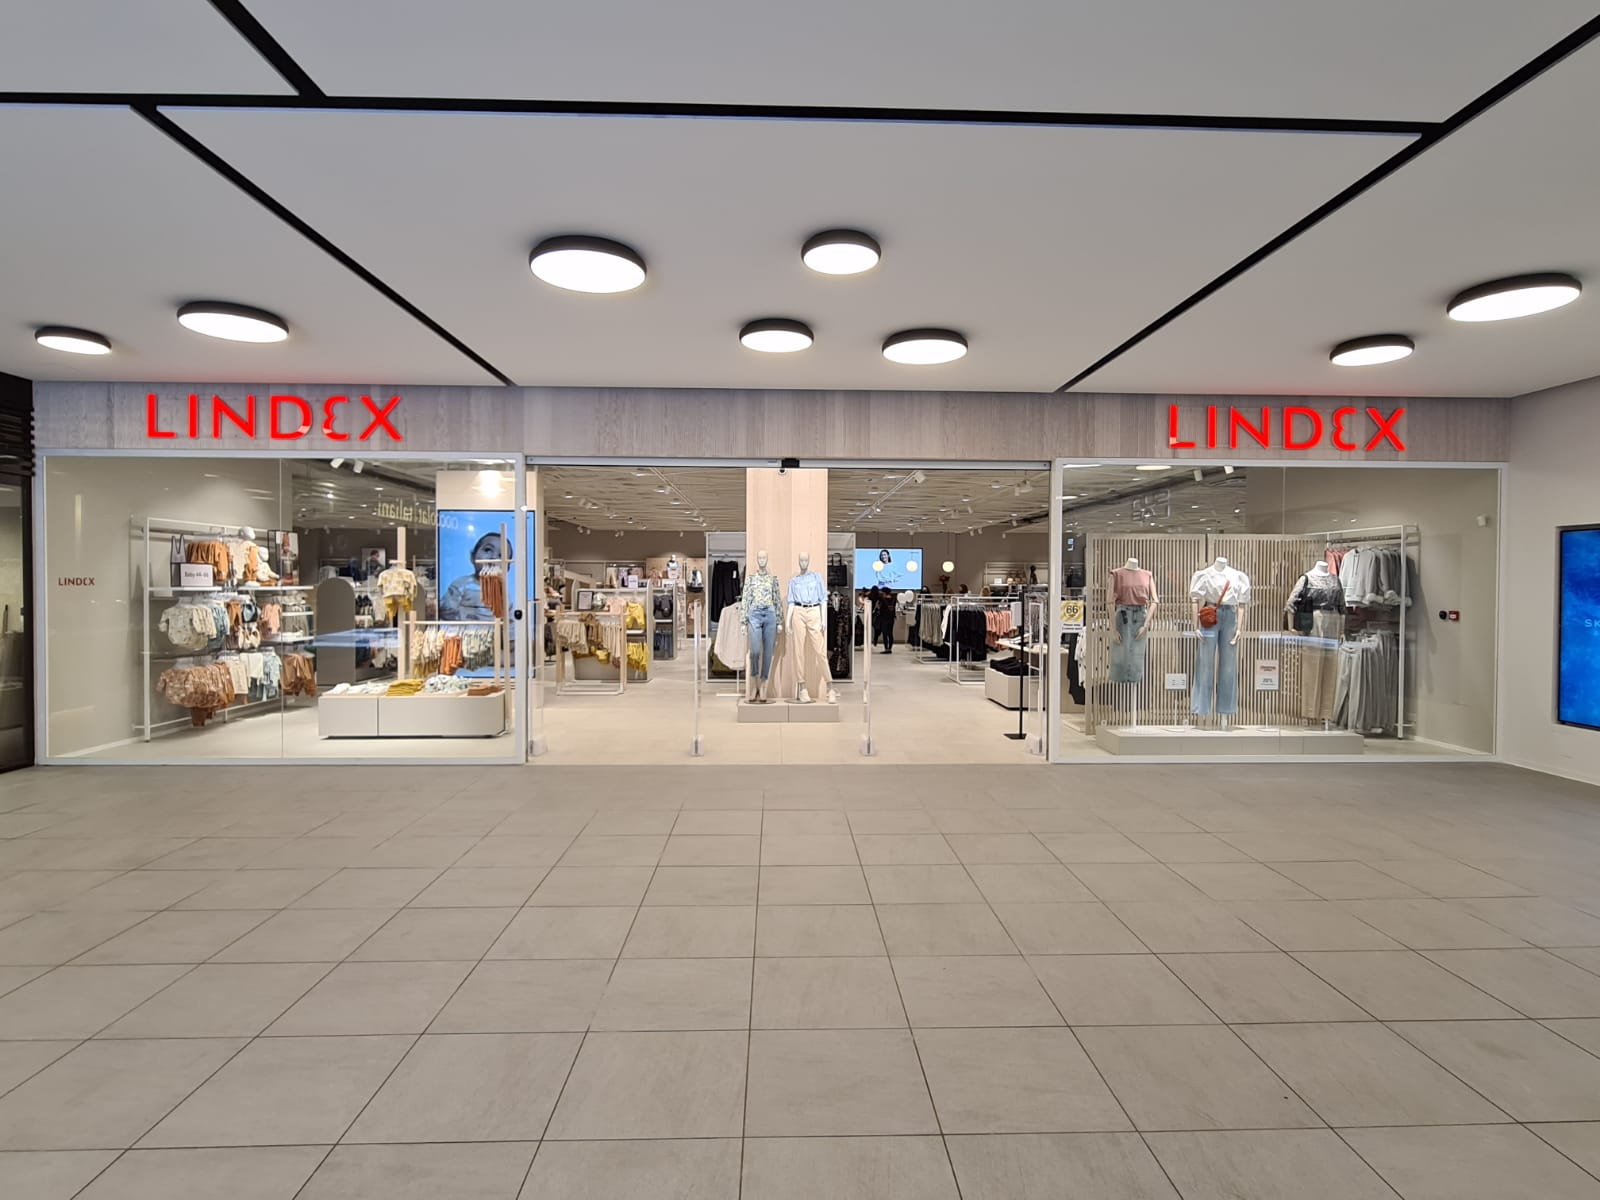 Lindex philips professional displays